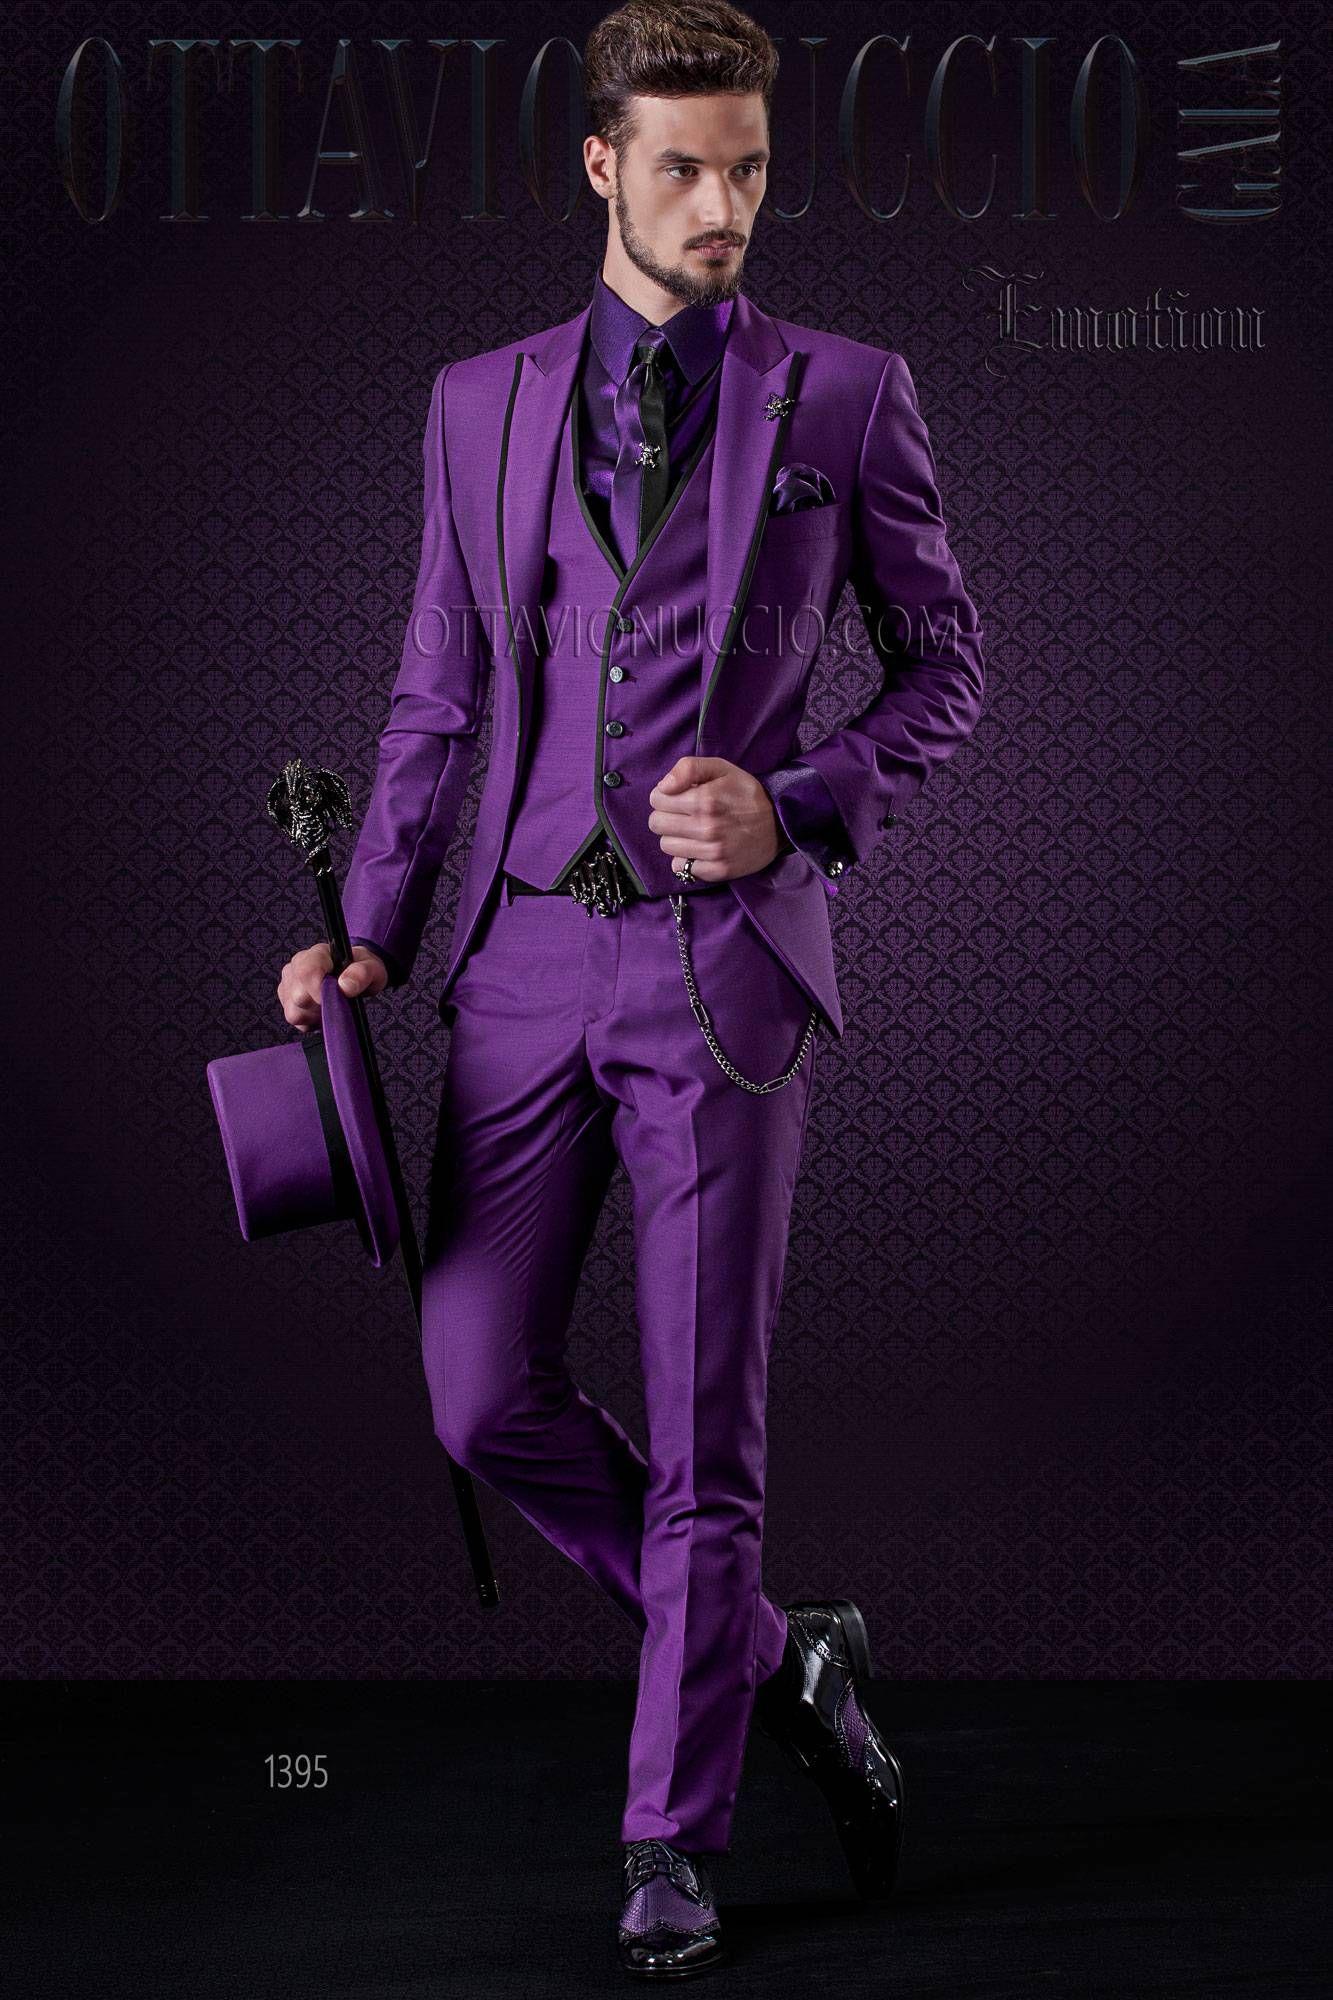 Pin by Kyle Smith on armor Tuxedo for men, Purple tuxedo